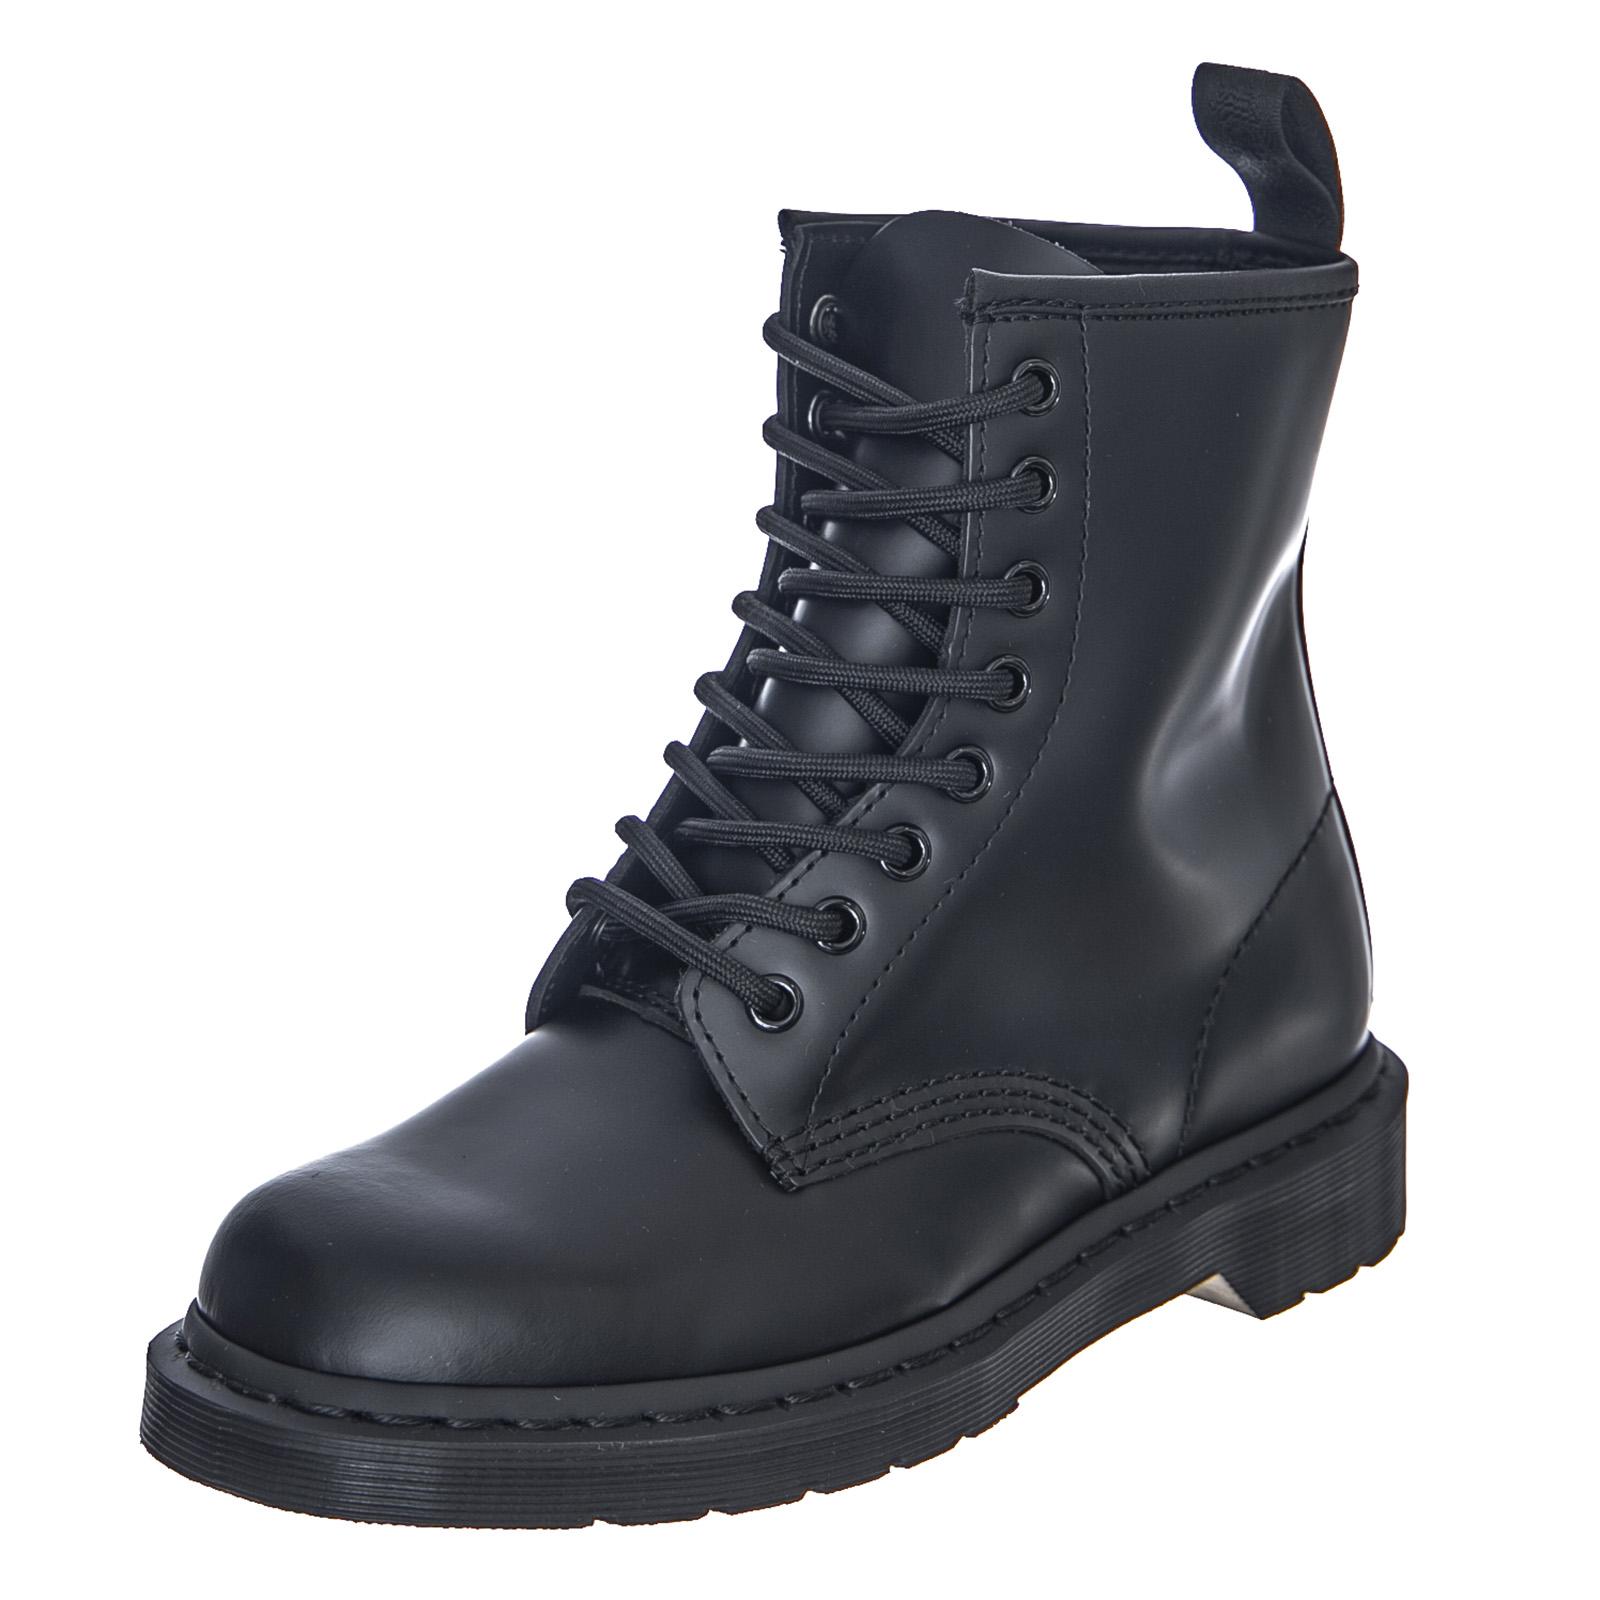 san francisco popular stores outlet for sale Details about Dr.Martens 1460 Mono - Black Smooth - Boots Man/Women Black